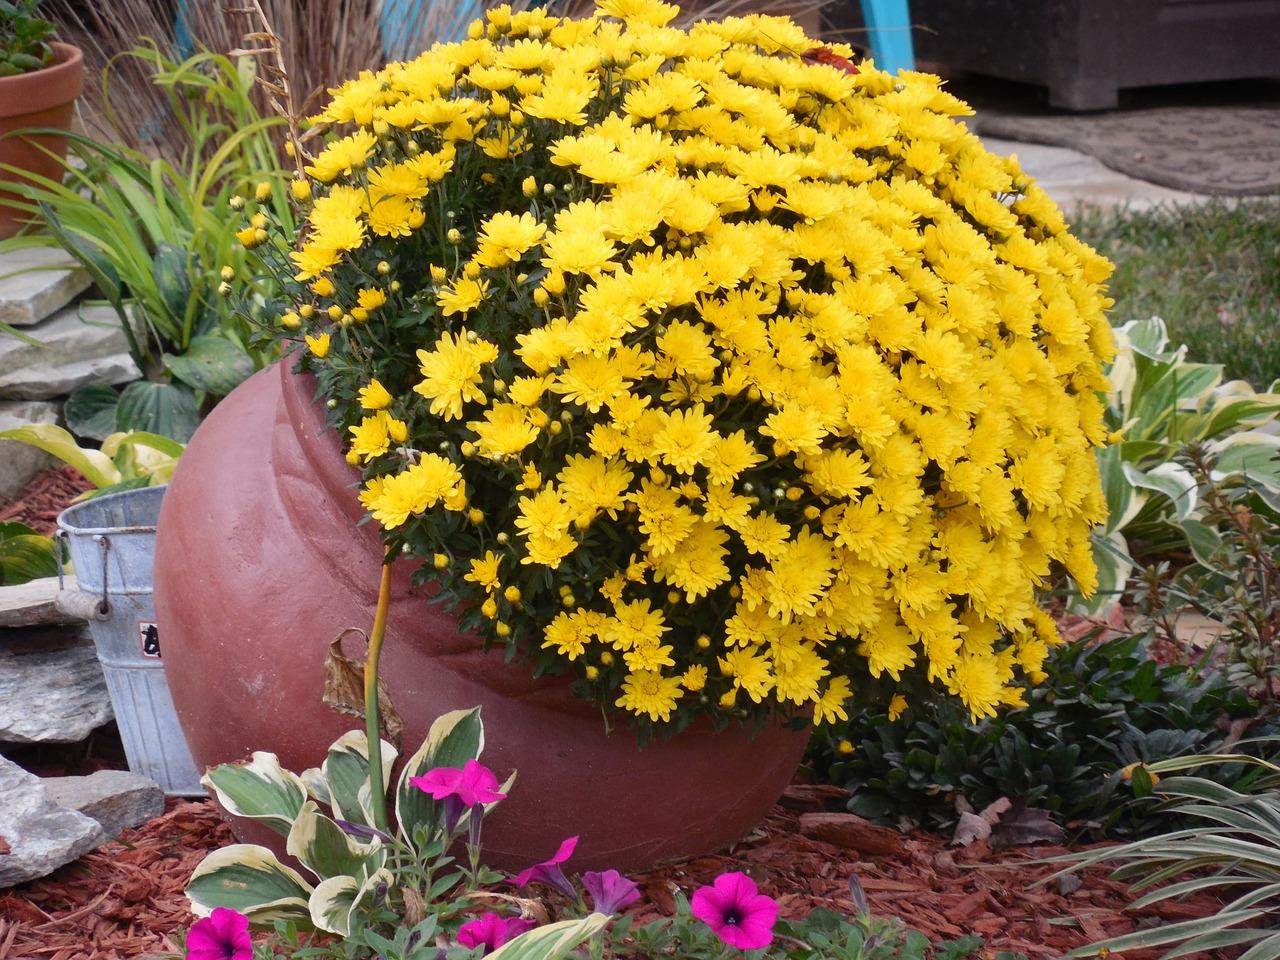 kvetinac-na-zahrade